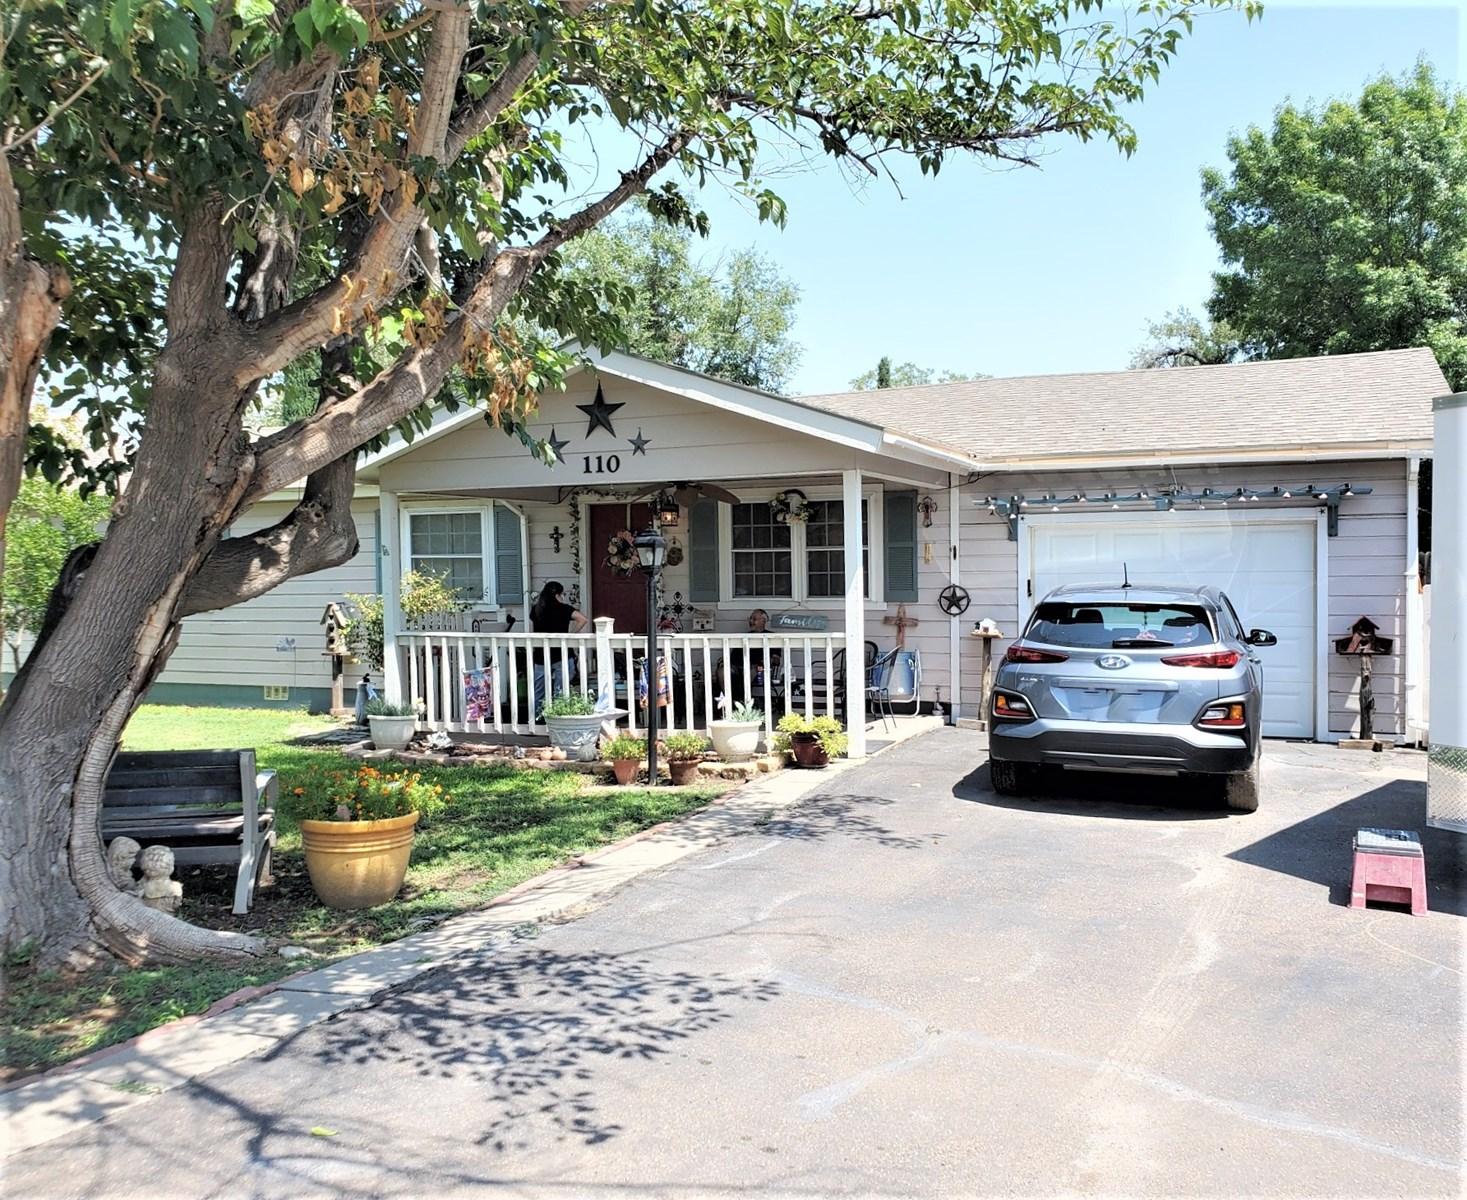 Balmorhea House For Sale 110 N San Antonio St Reeves Co